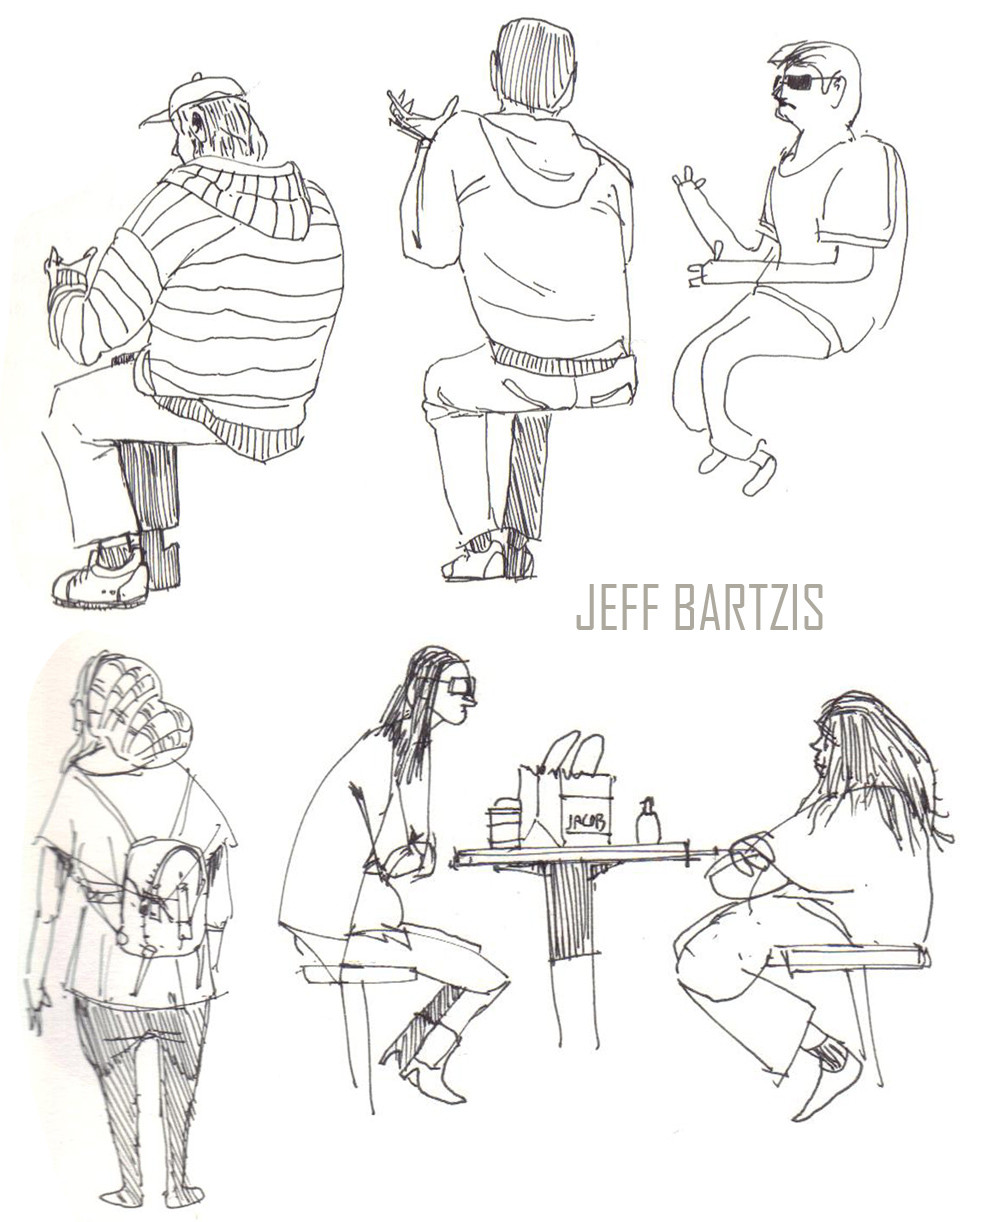 Jeff bartzis sketchbook stuff 041